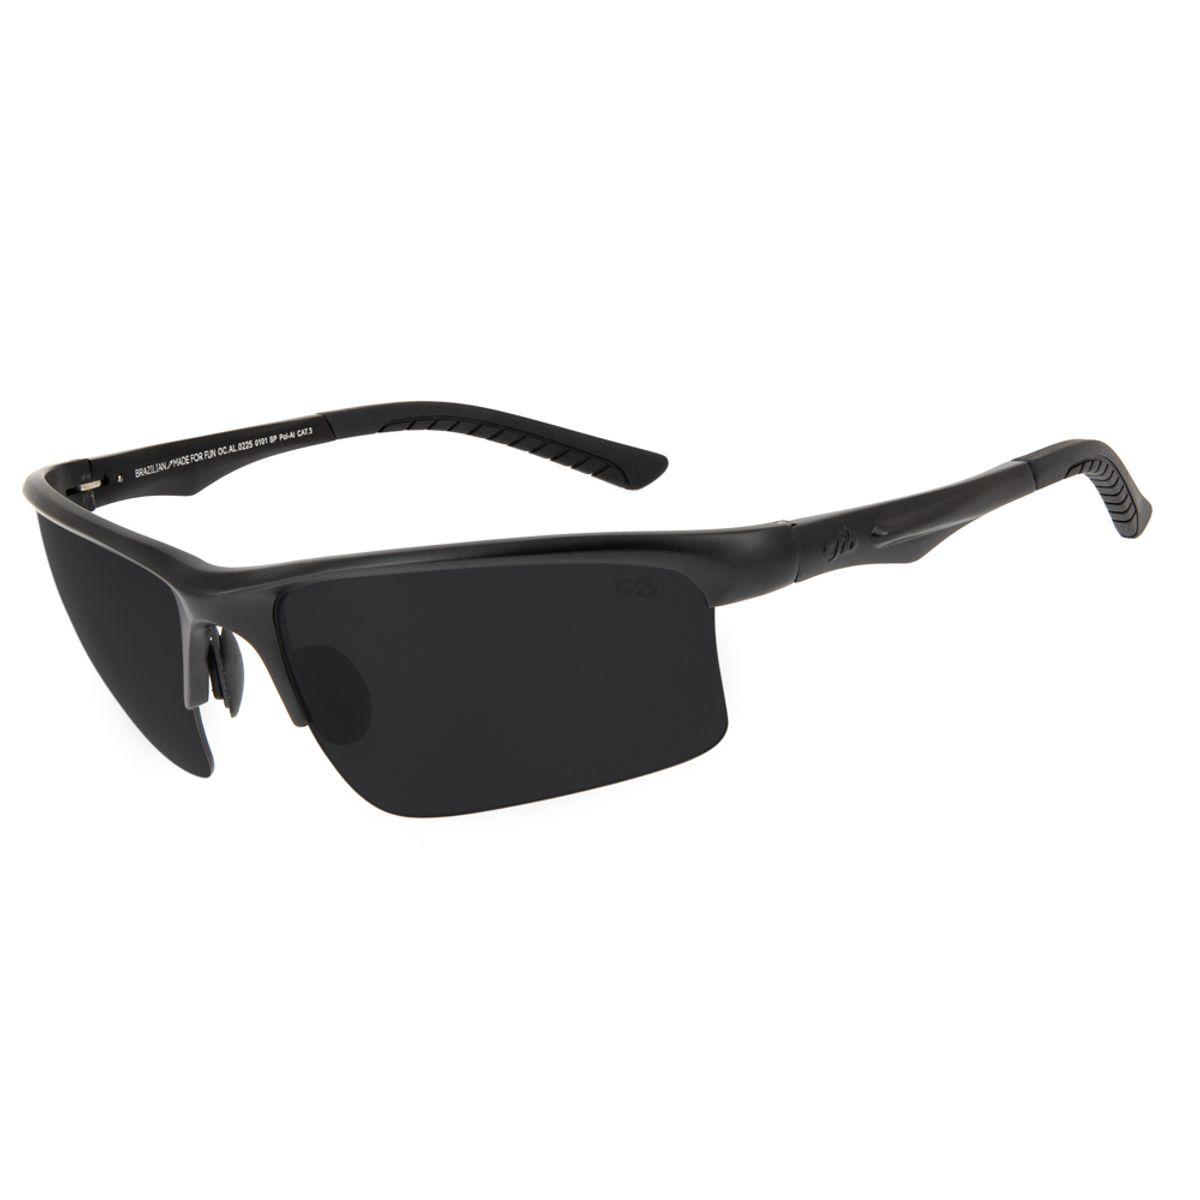 75c00b581 Óculos de Sol Chilli Beans Esportivo Masculino Polarizado Preto 0225 -  OC.AL.0225.0101 M. REF: OC.AL.0225.0101. OC.